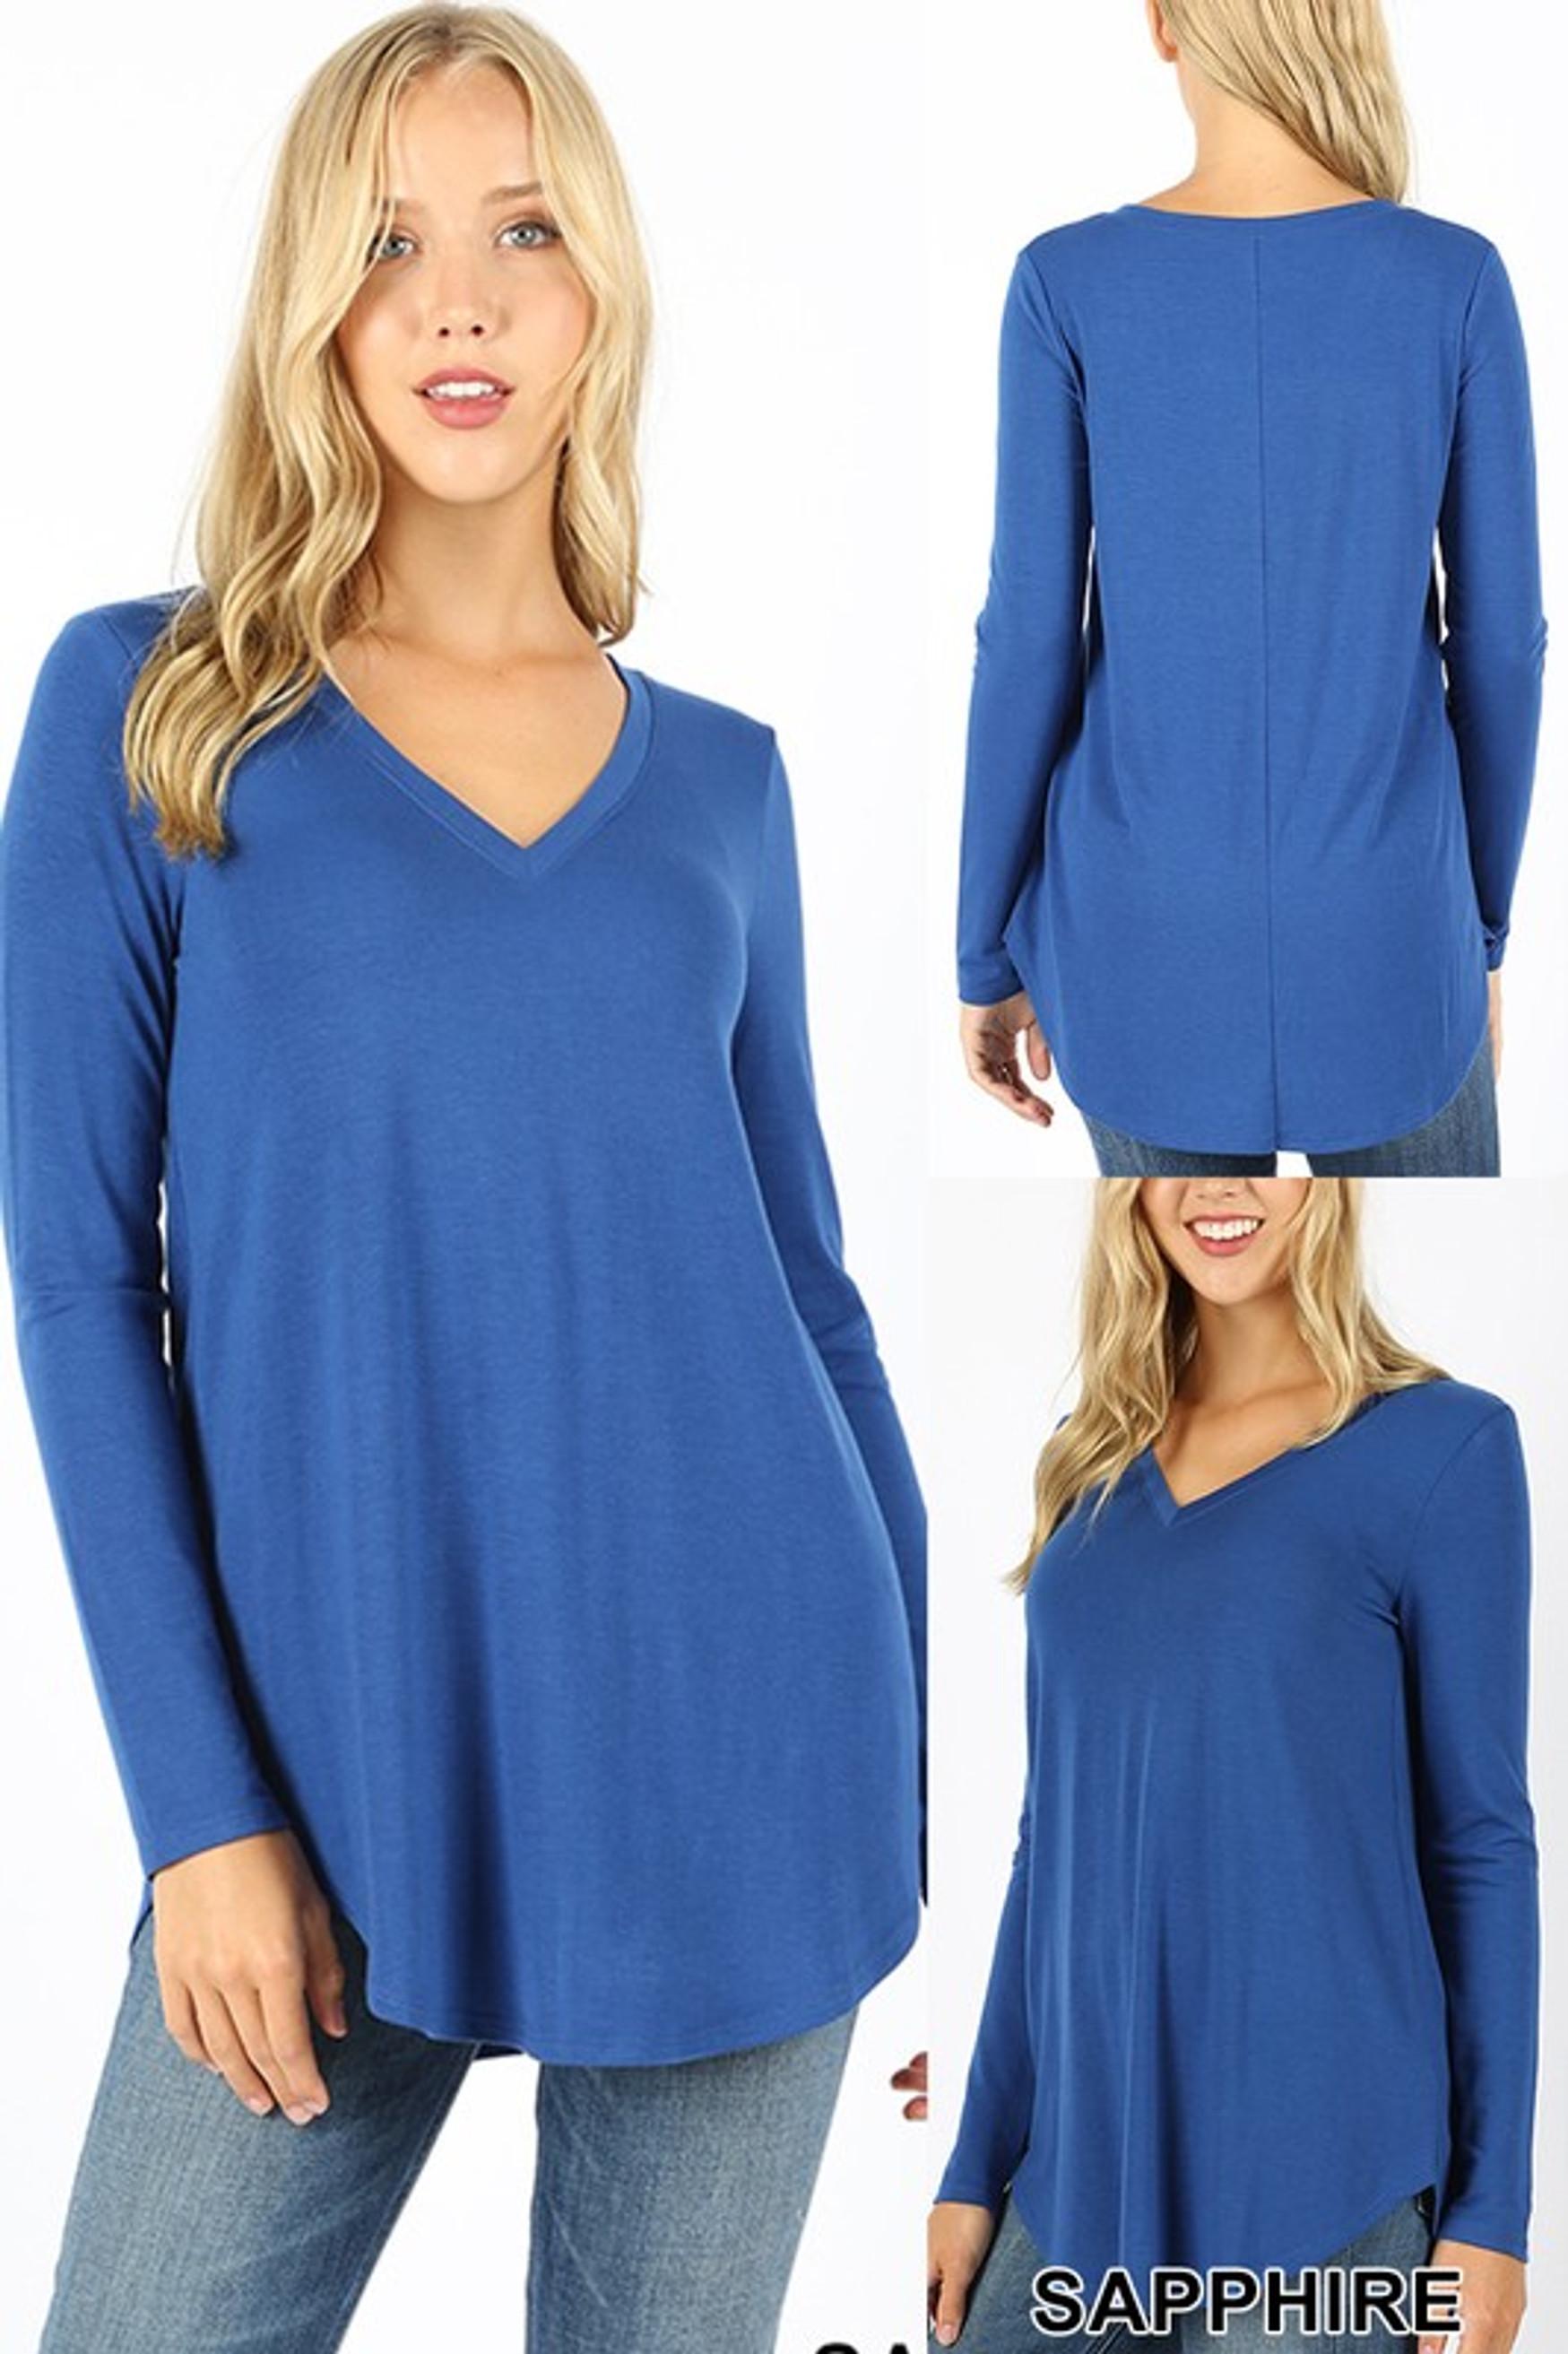 Premium V-Neck Round Hem Long Sleeve Top